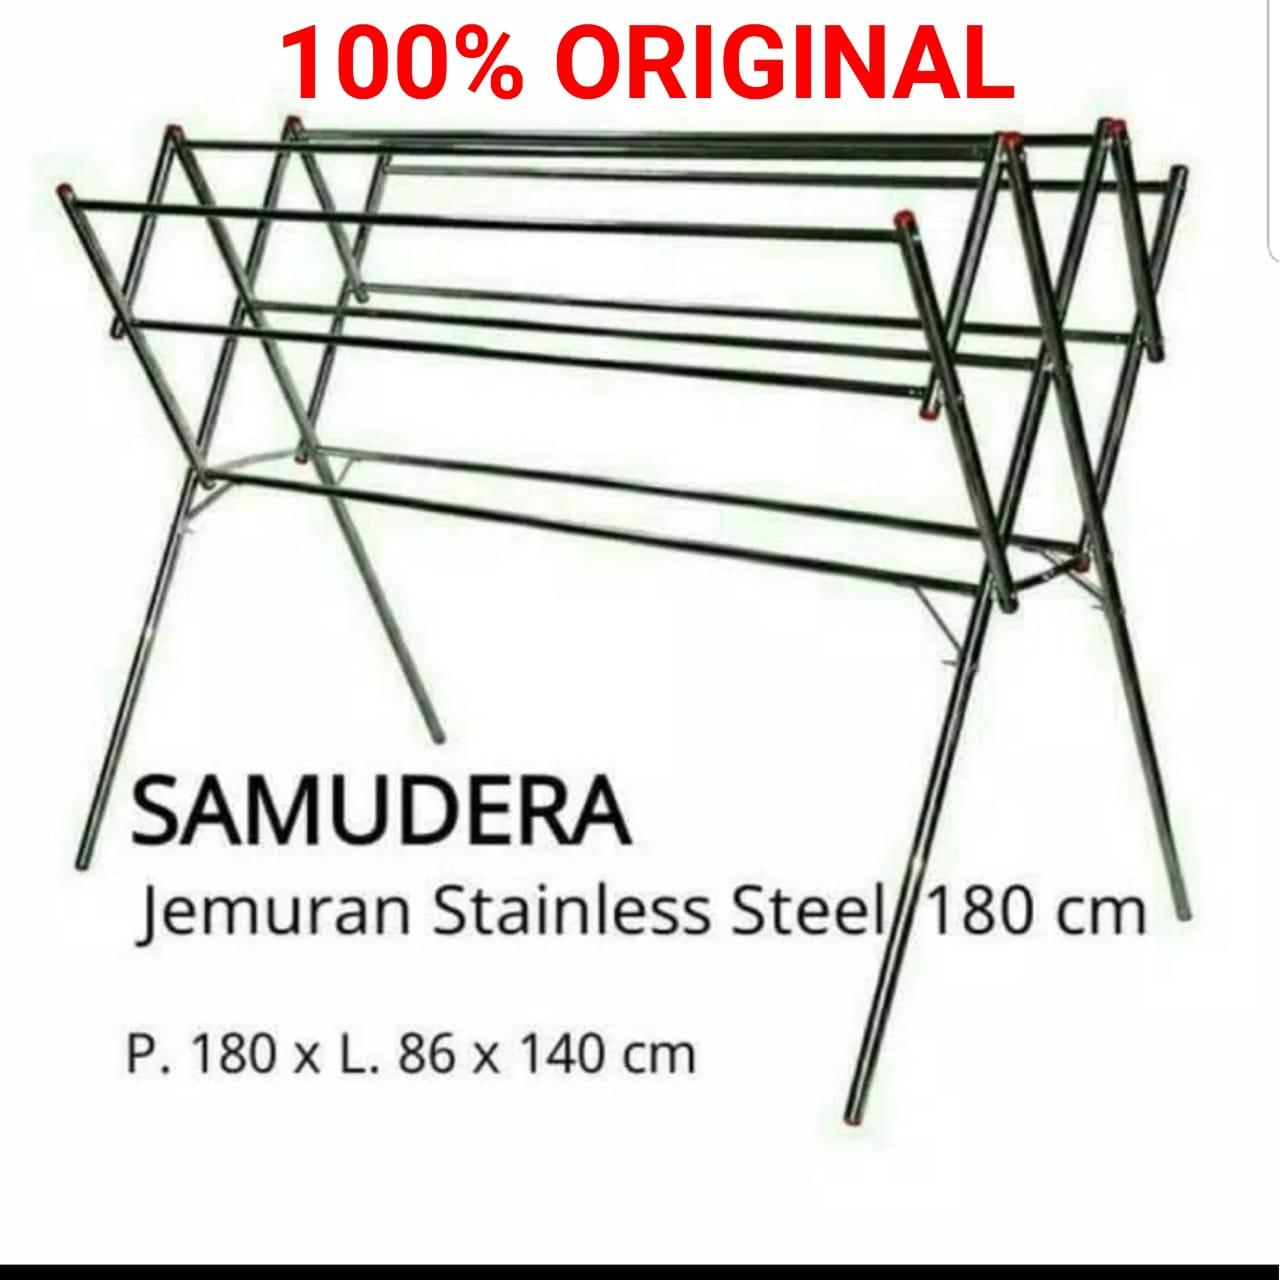 Jemuran Stainless Steel Uk 180 Cm Original Samudera By Furnikita Furniture.